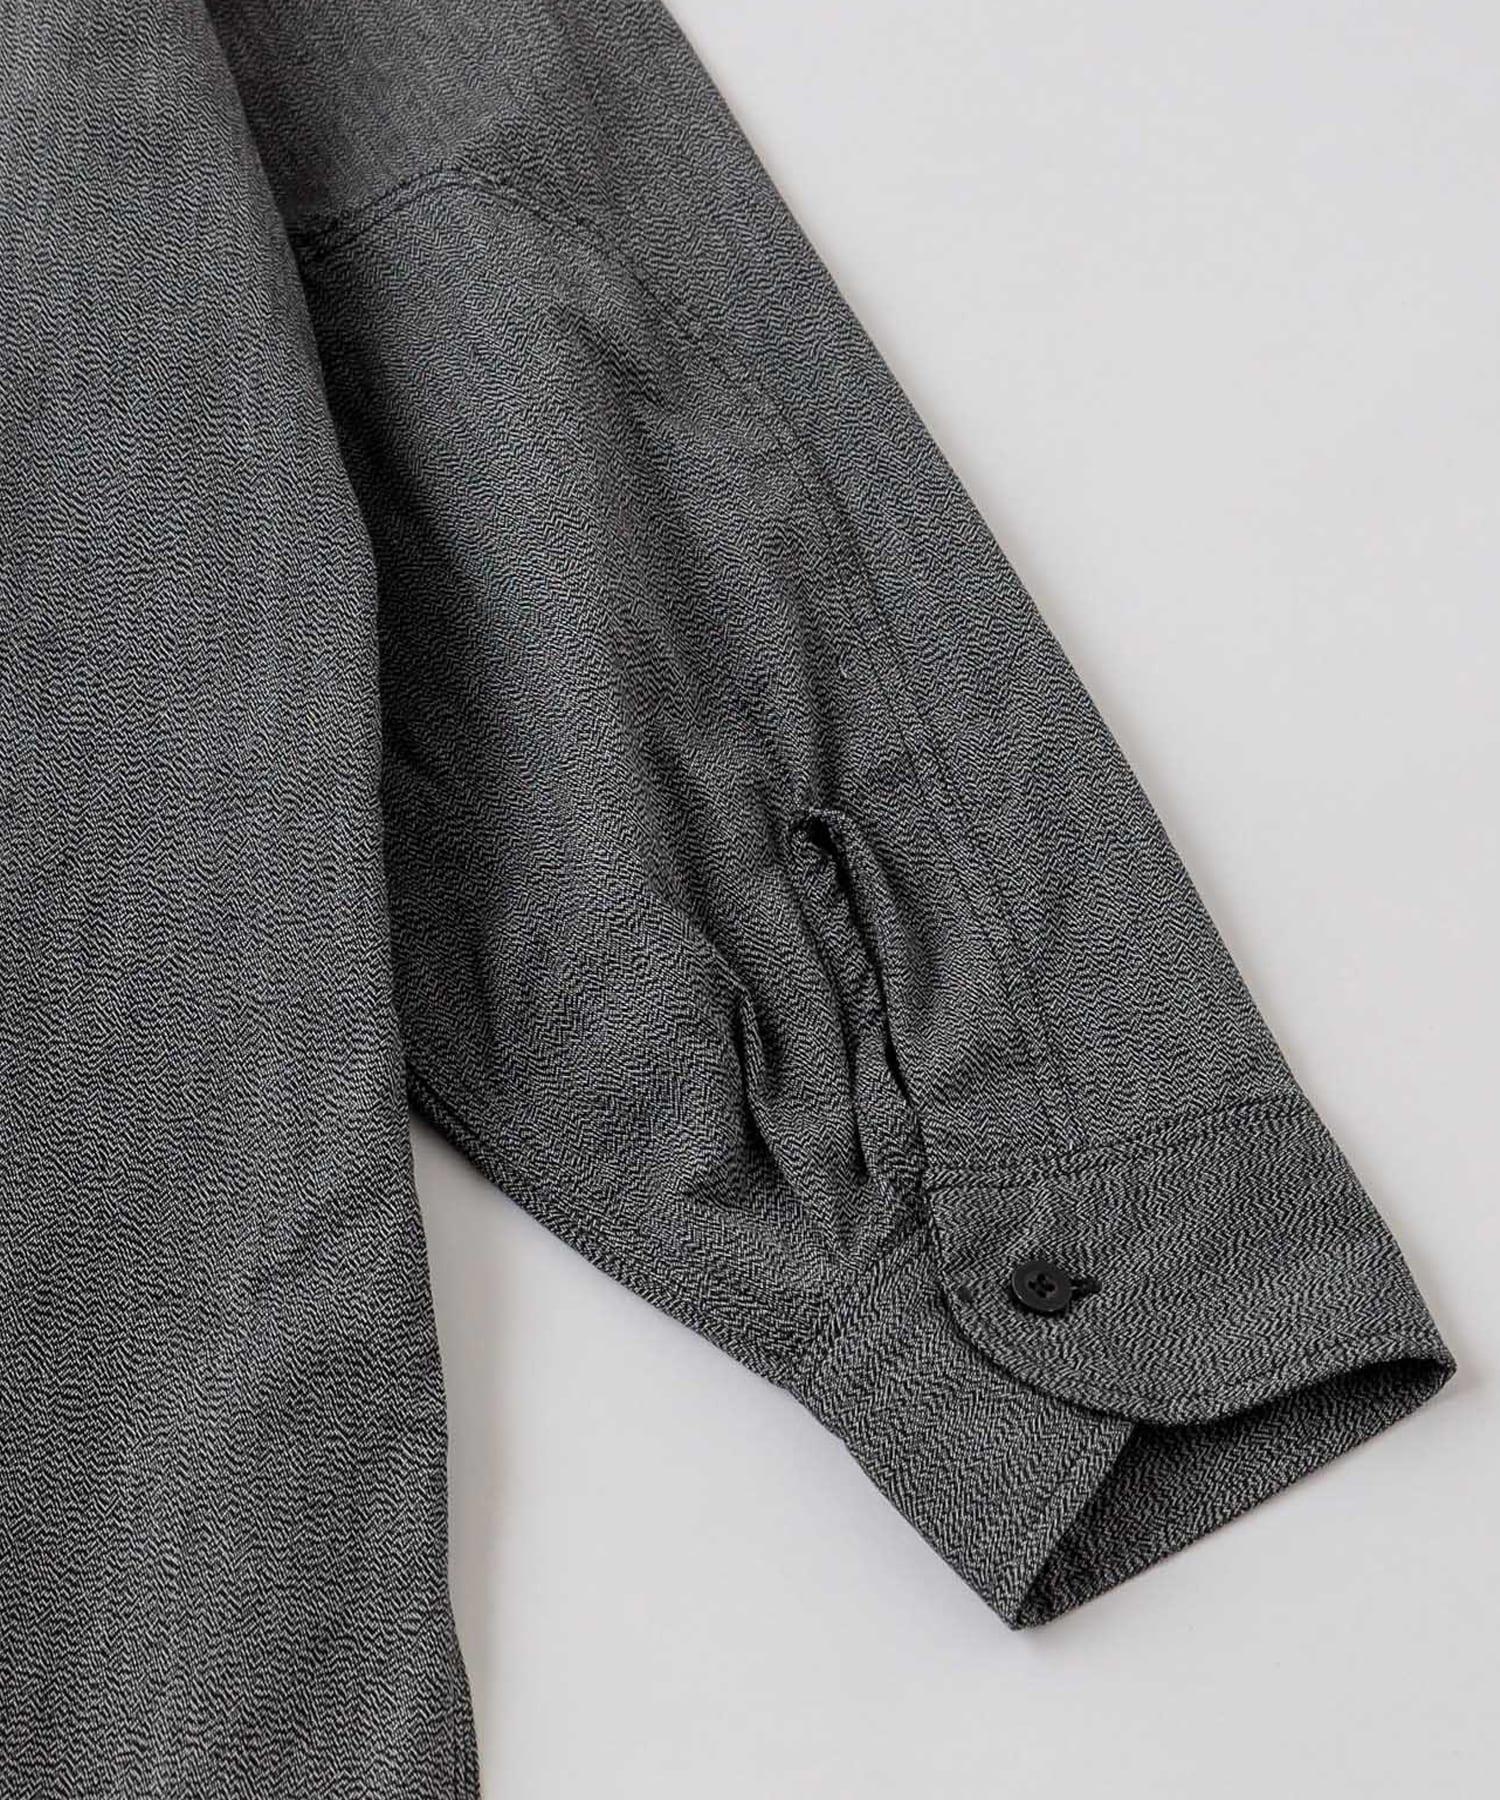 BLOOM&BRANCH(ブルームアンドブランチ) blurhms / Classic Chambray Work Shirt